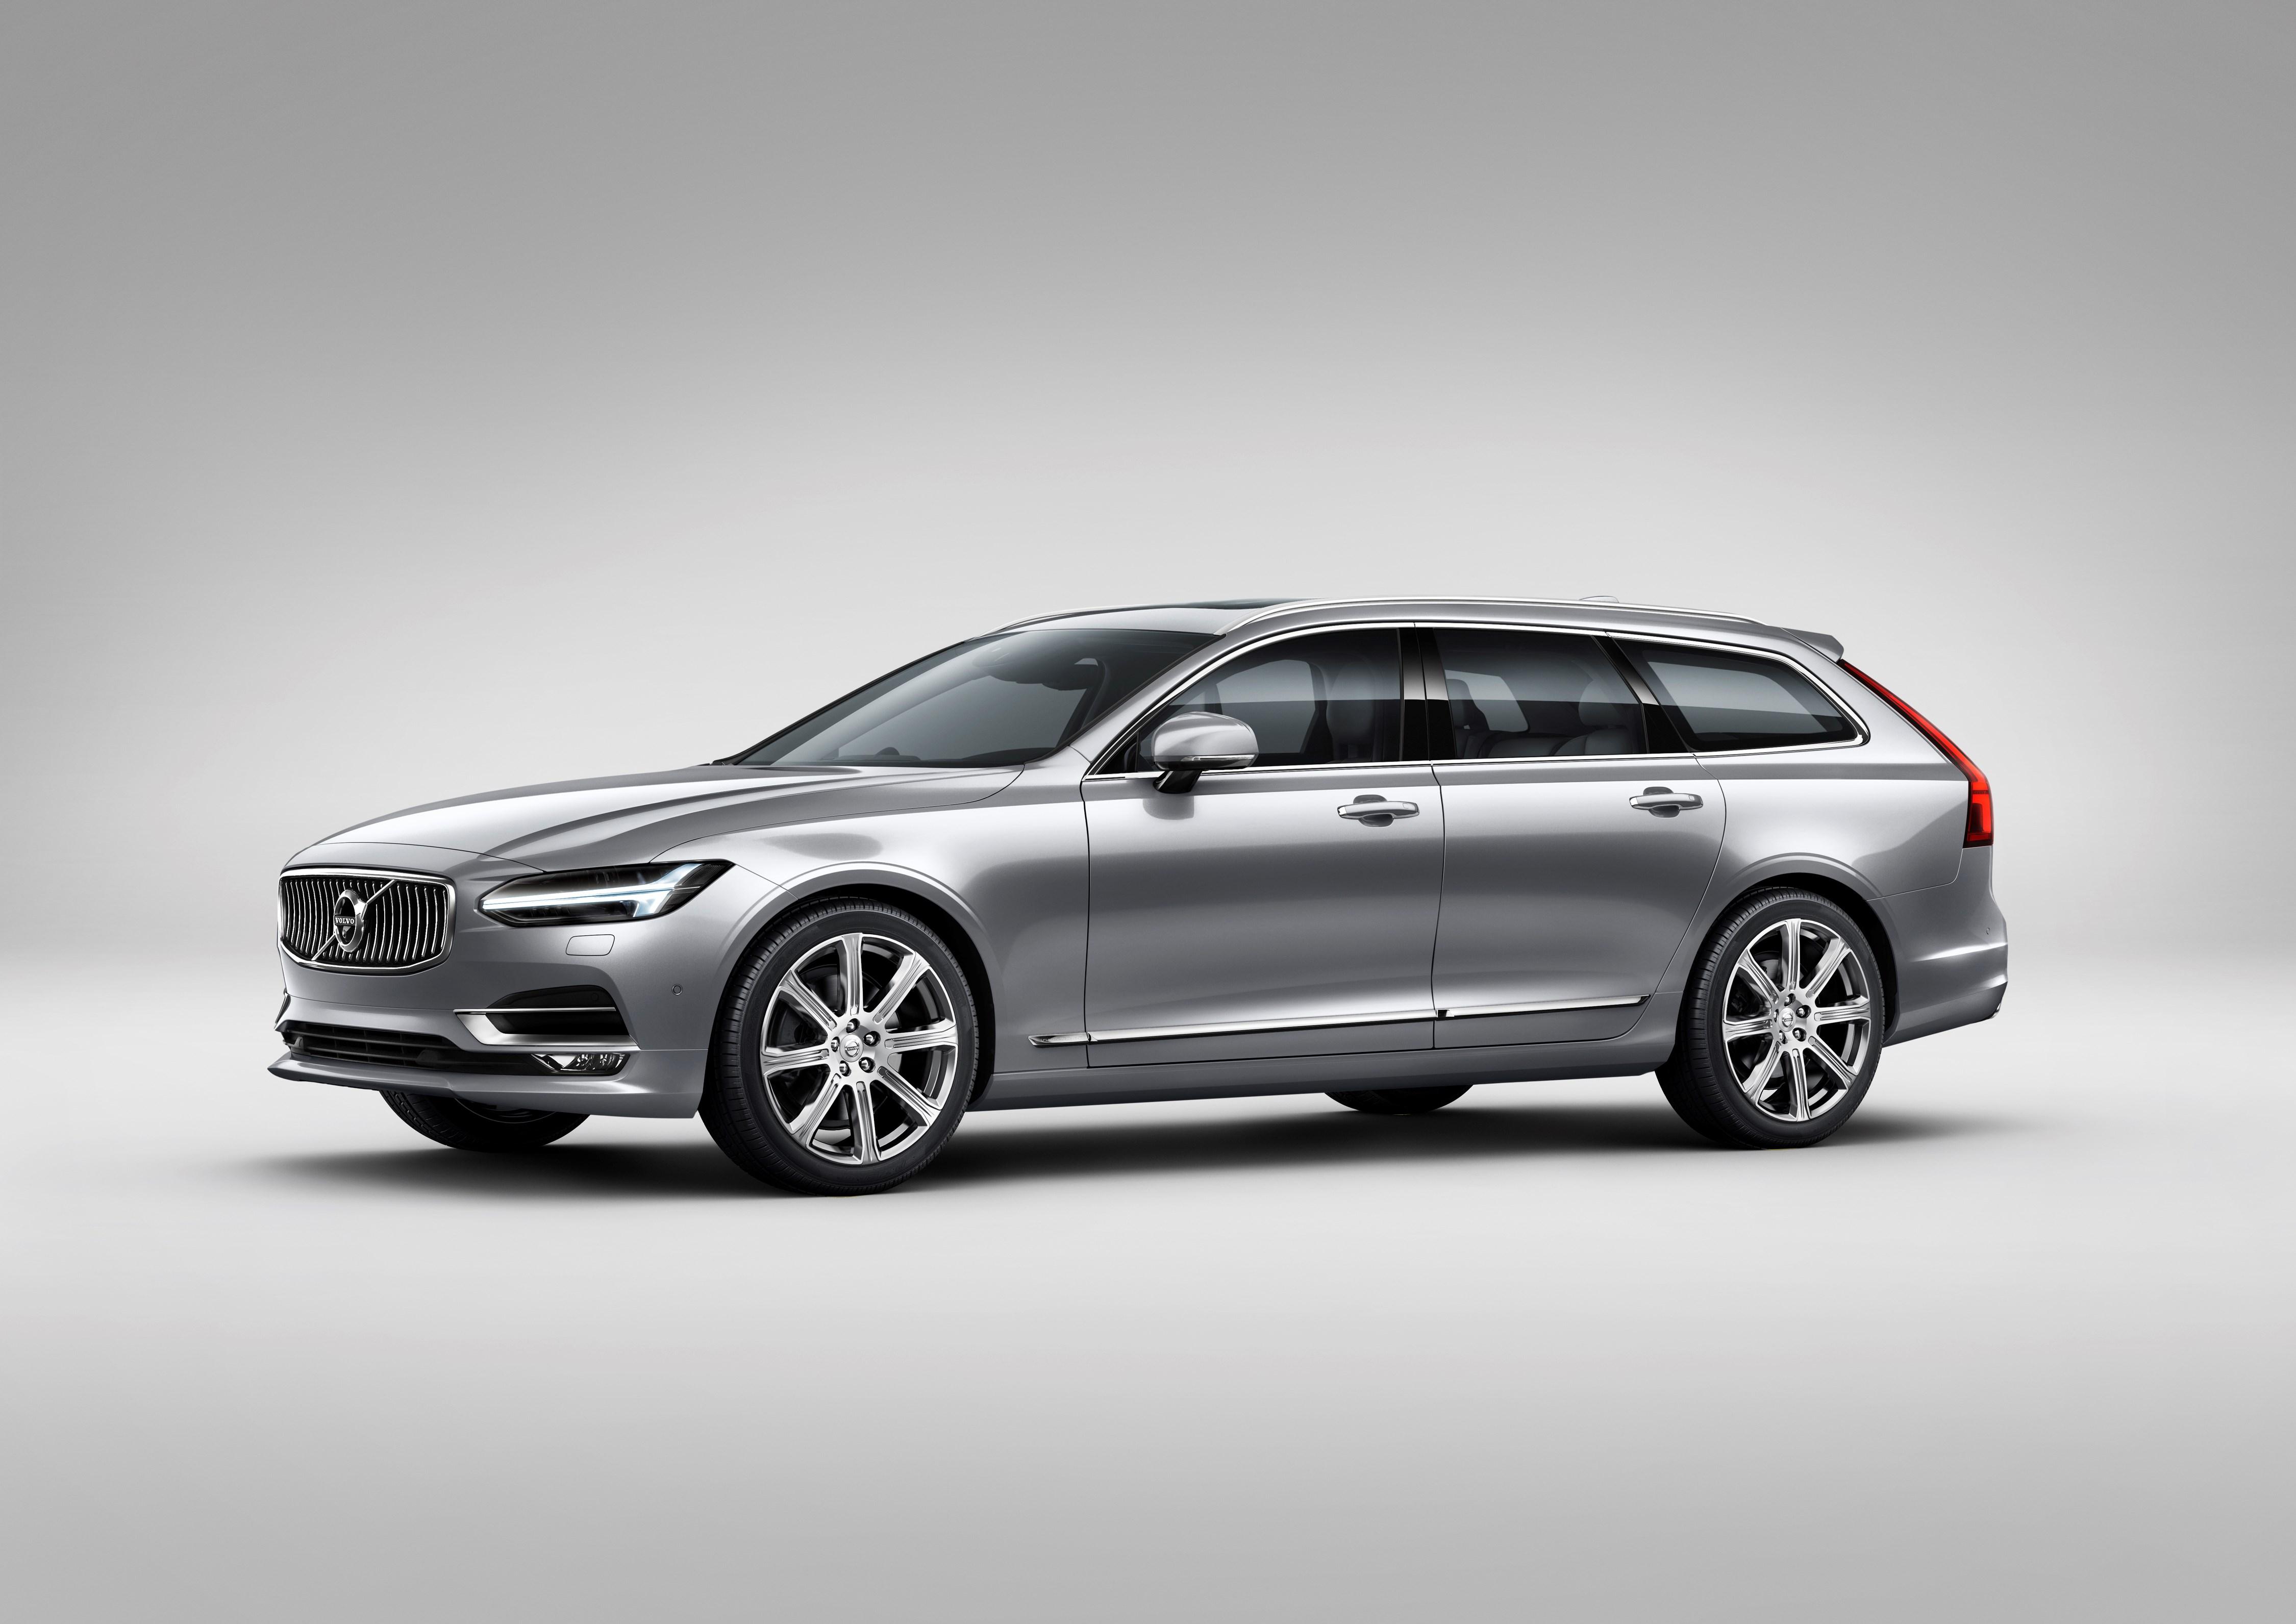 S80 Volvo 2017 >> 2016 Volvo V90 Wagon Officially Revealed In Sweden Autoevolution